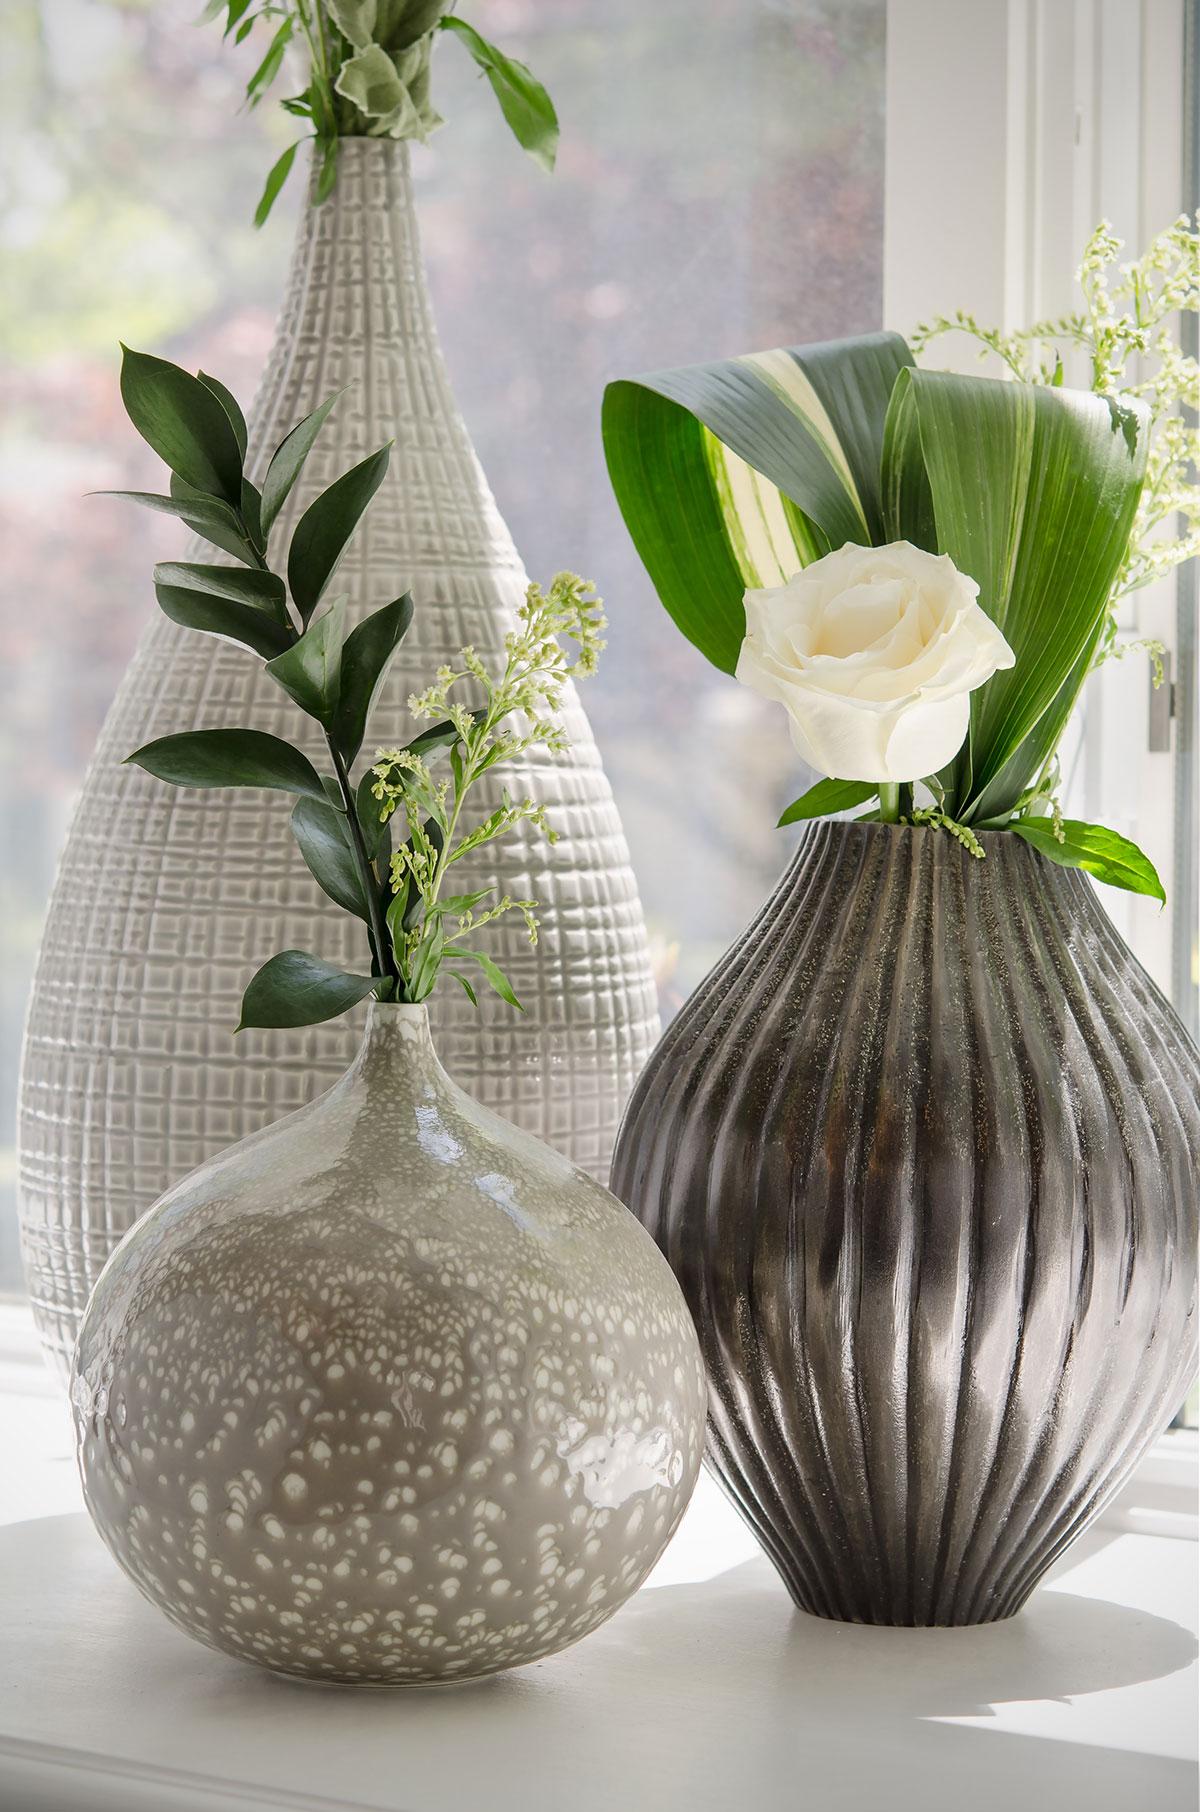 Braintree, MA interior design grouping of textured vases